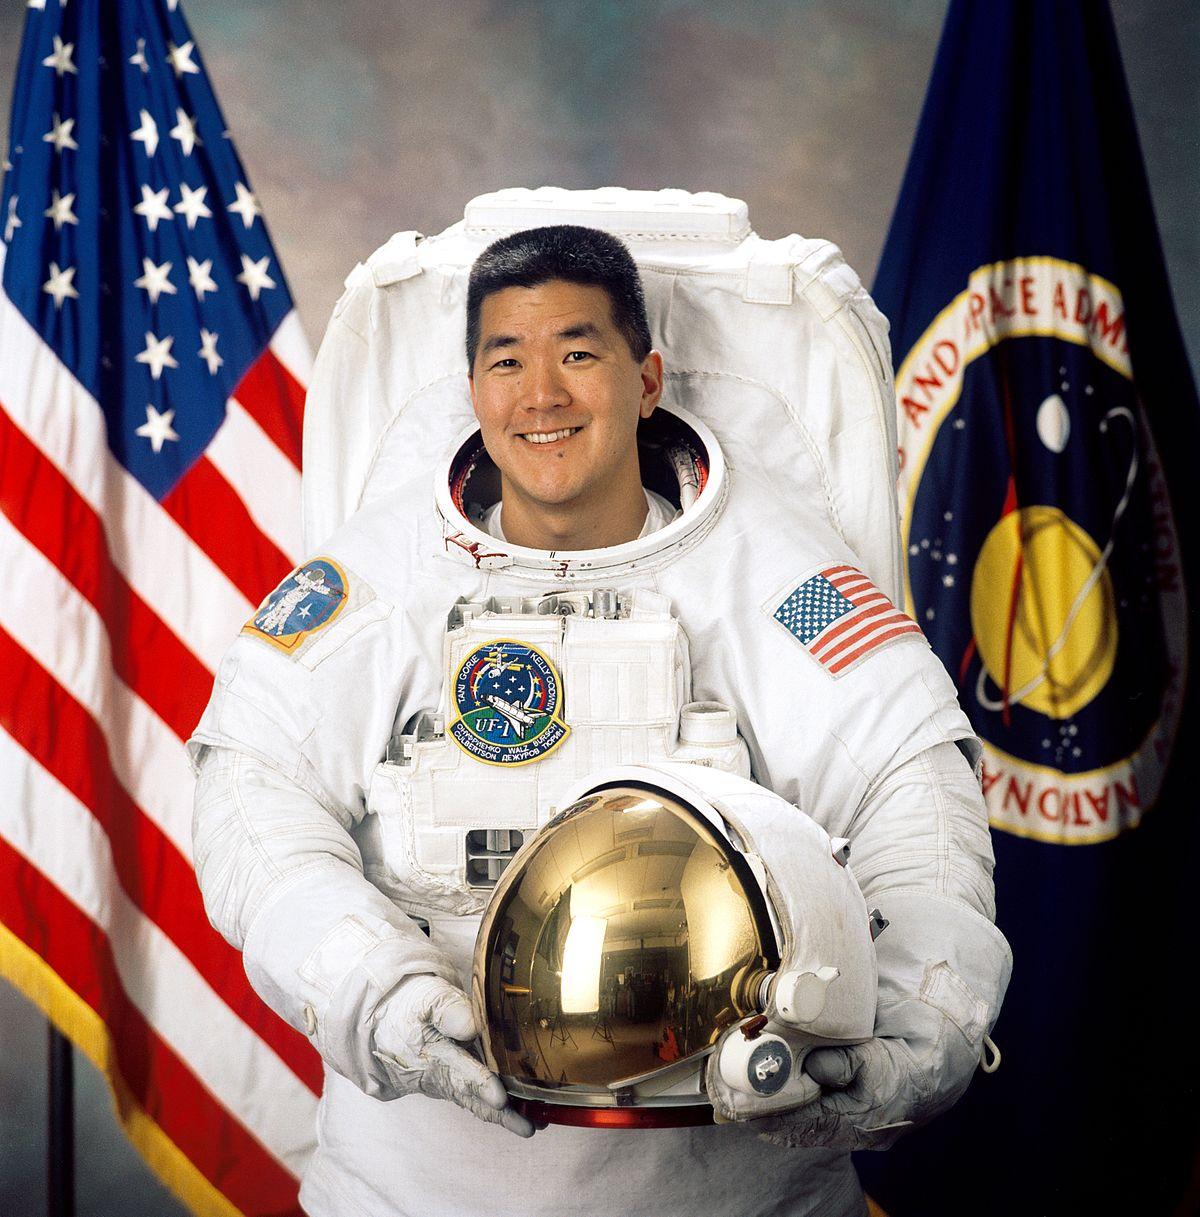 astronaut space team - photo #15